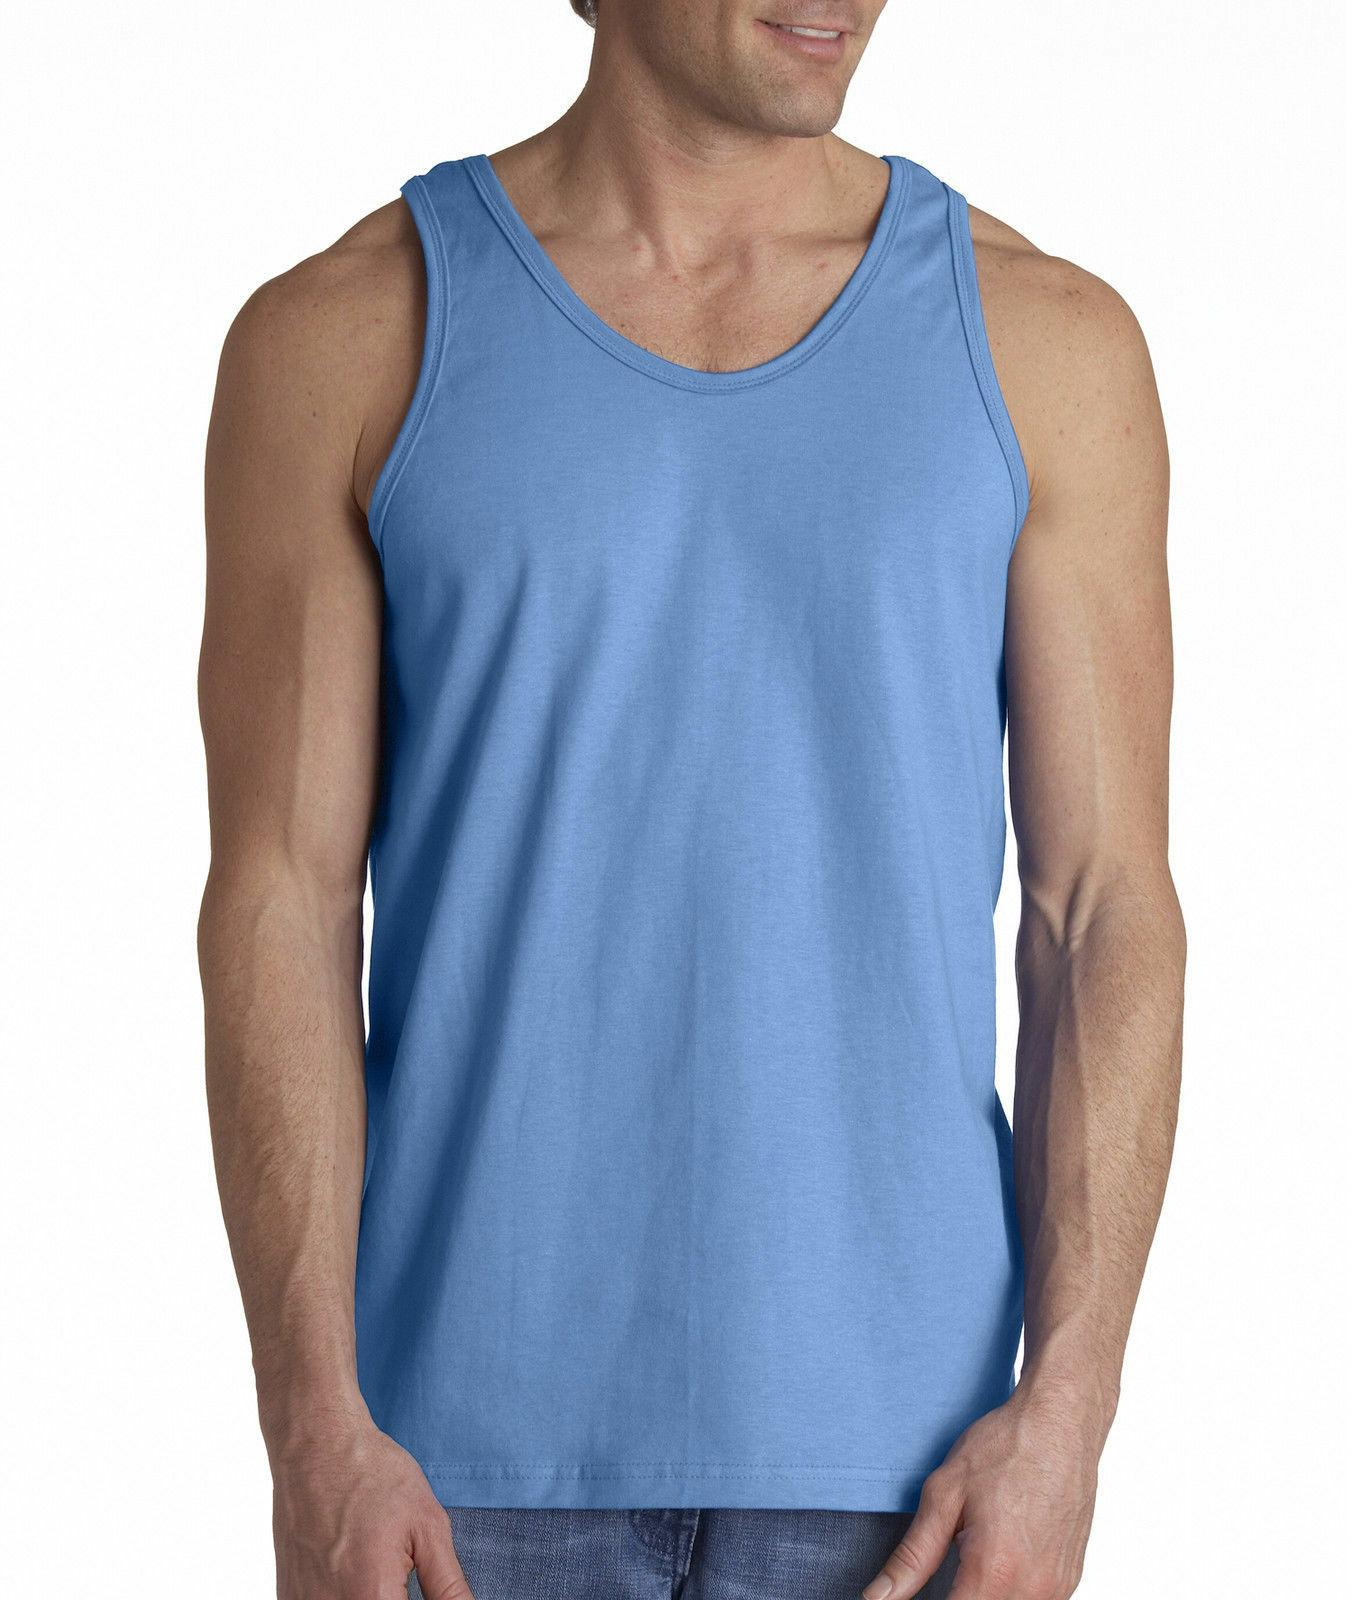 Men's Muscle Gym Tee A-Shirt